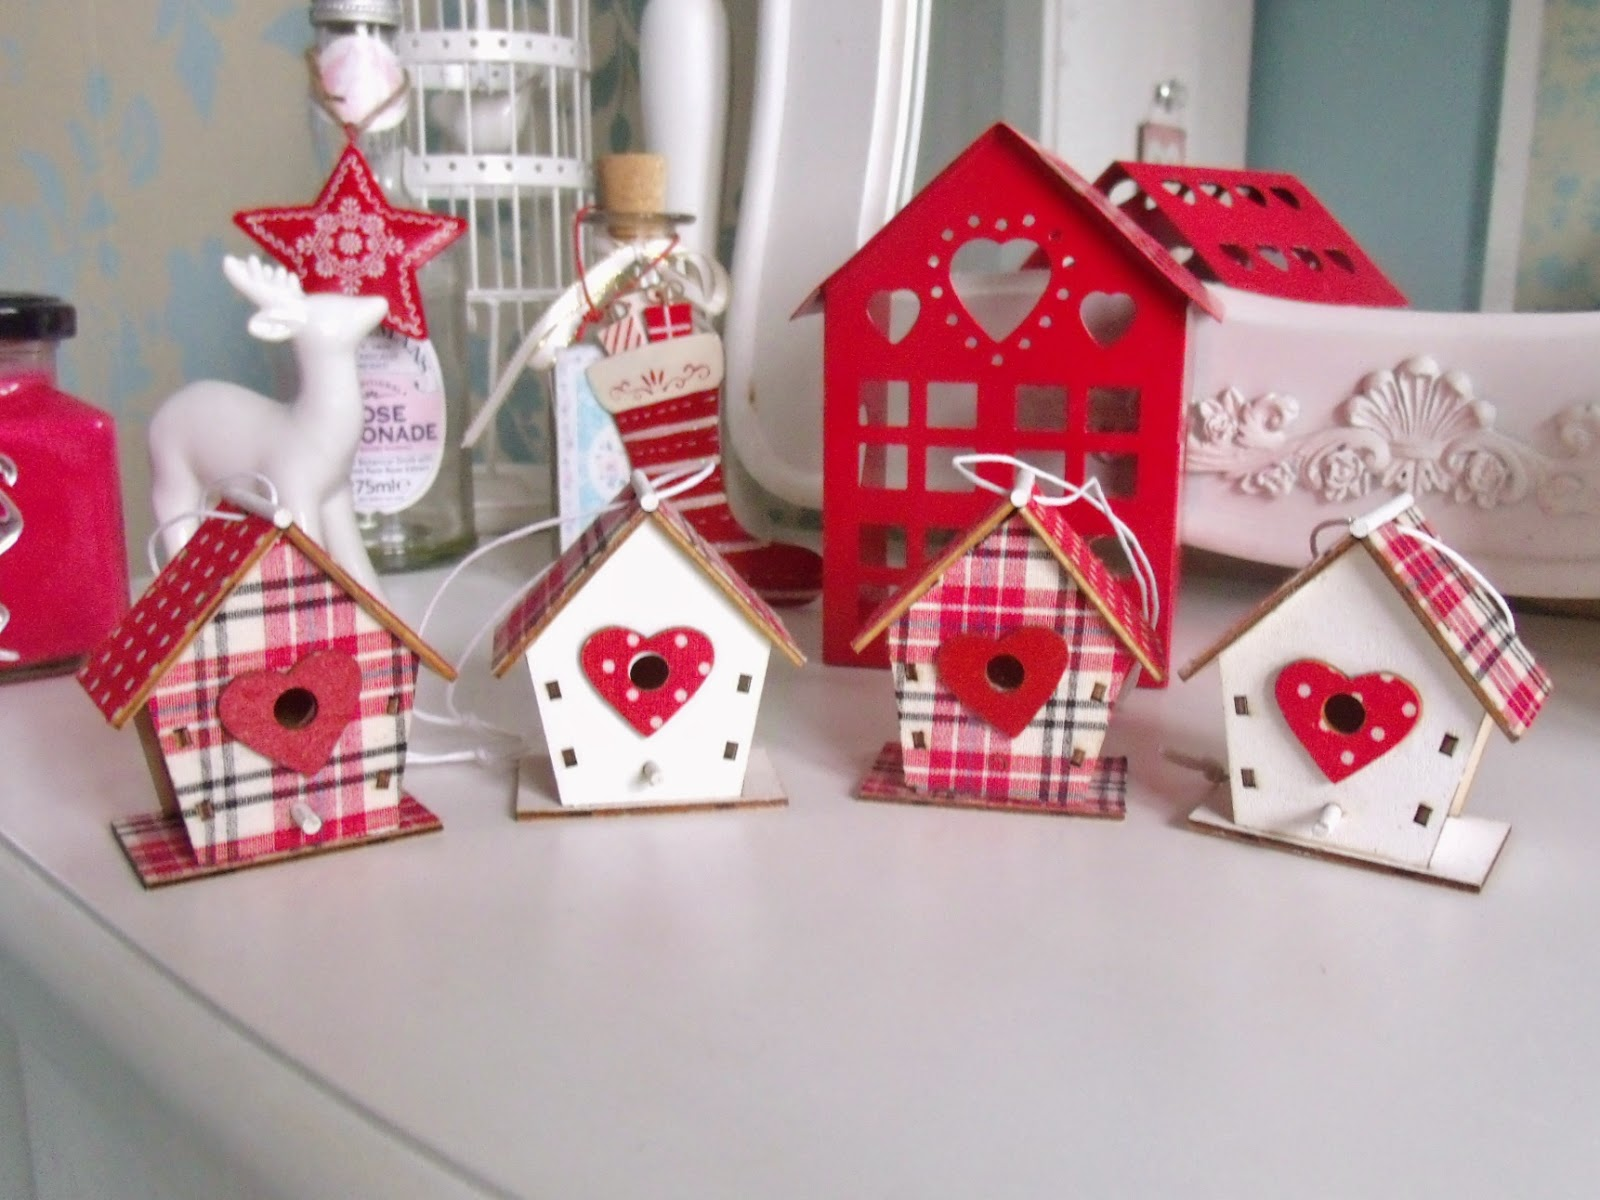 My Favourite Christmas Decorations Victoria 39 S Vintage Blog